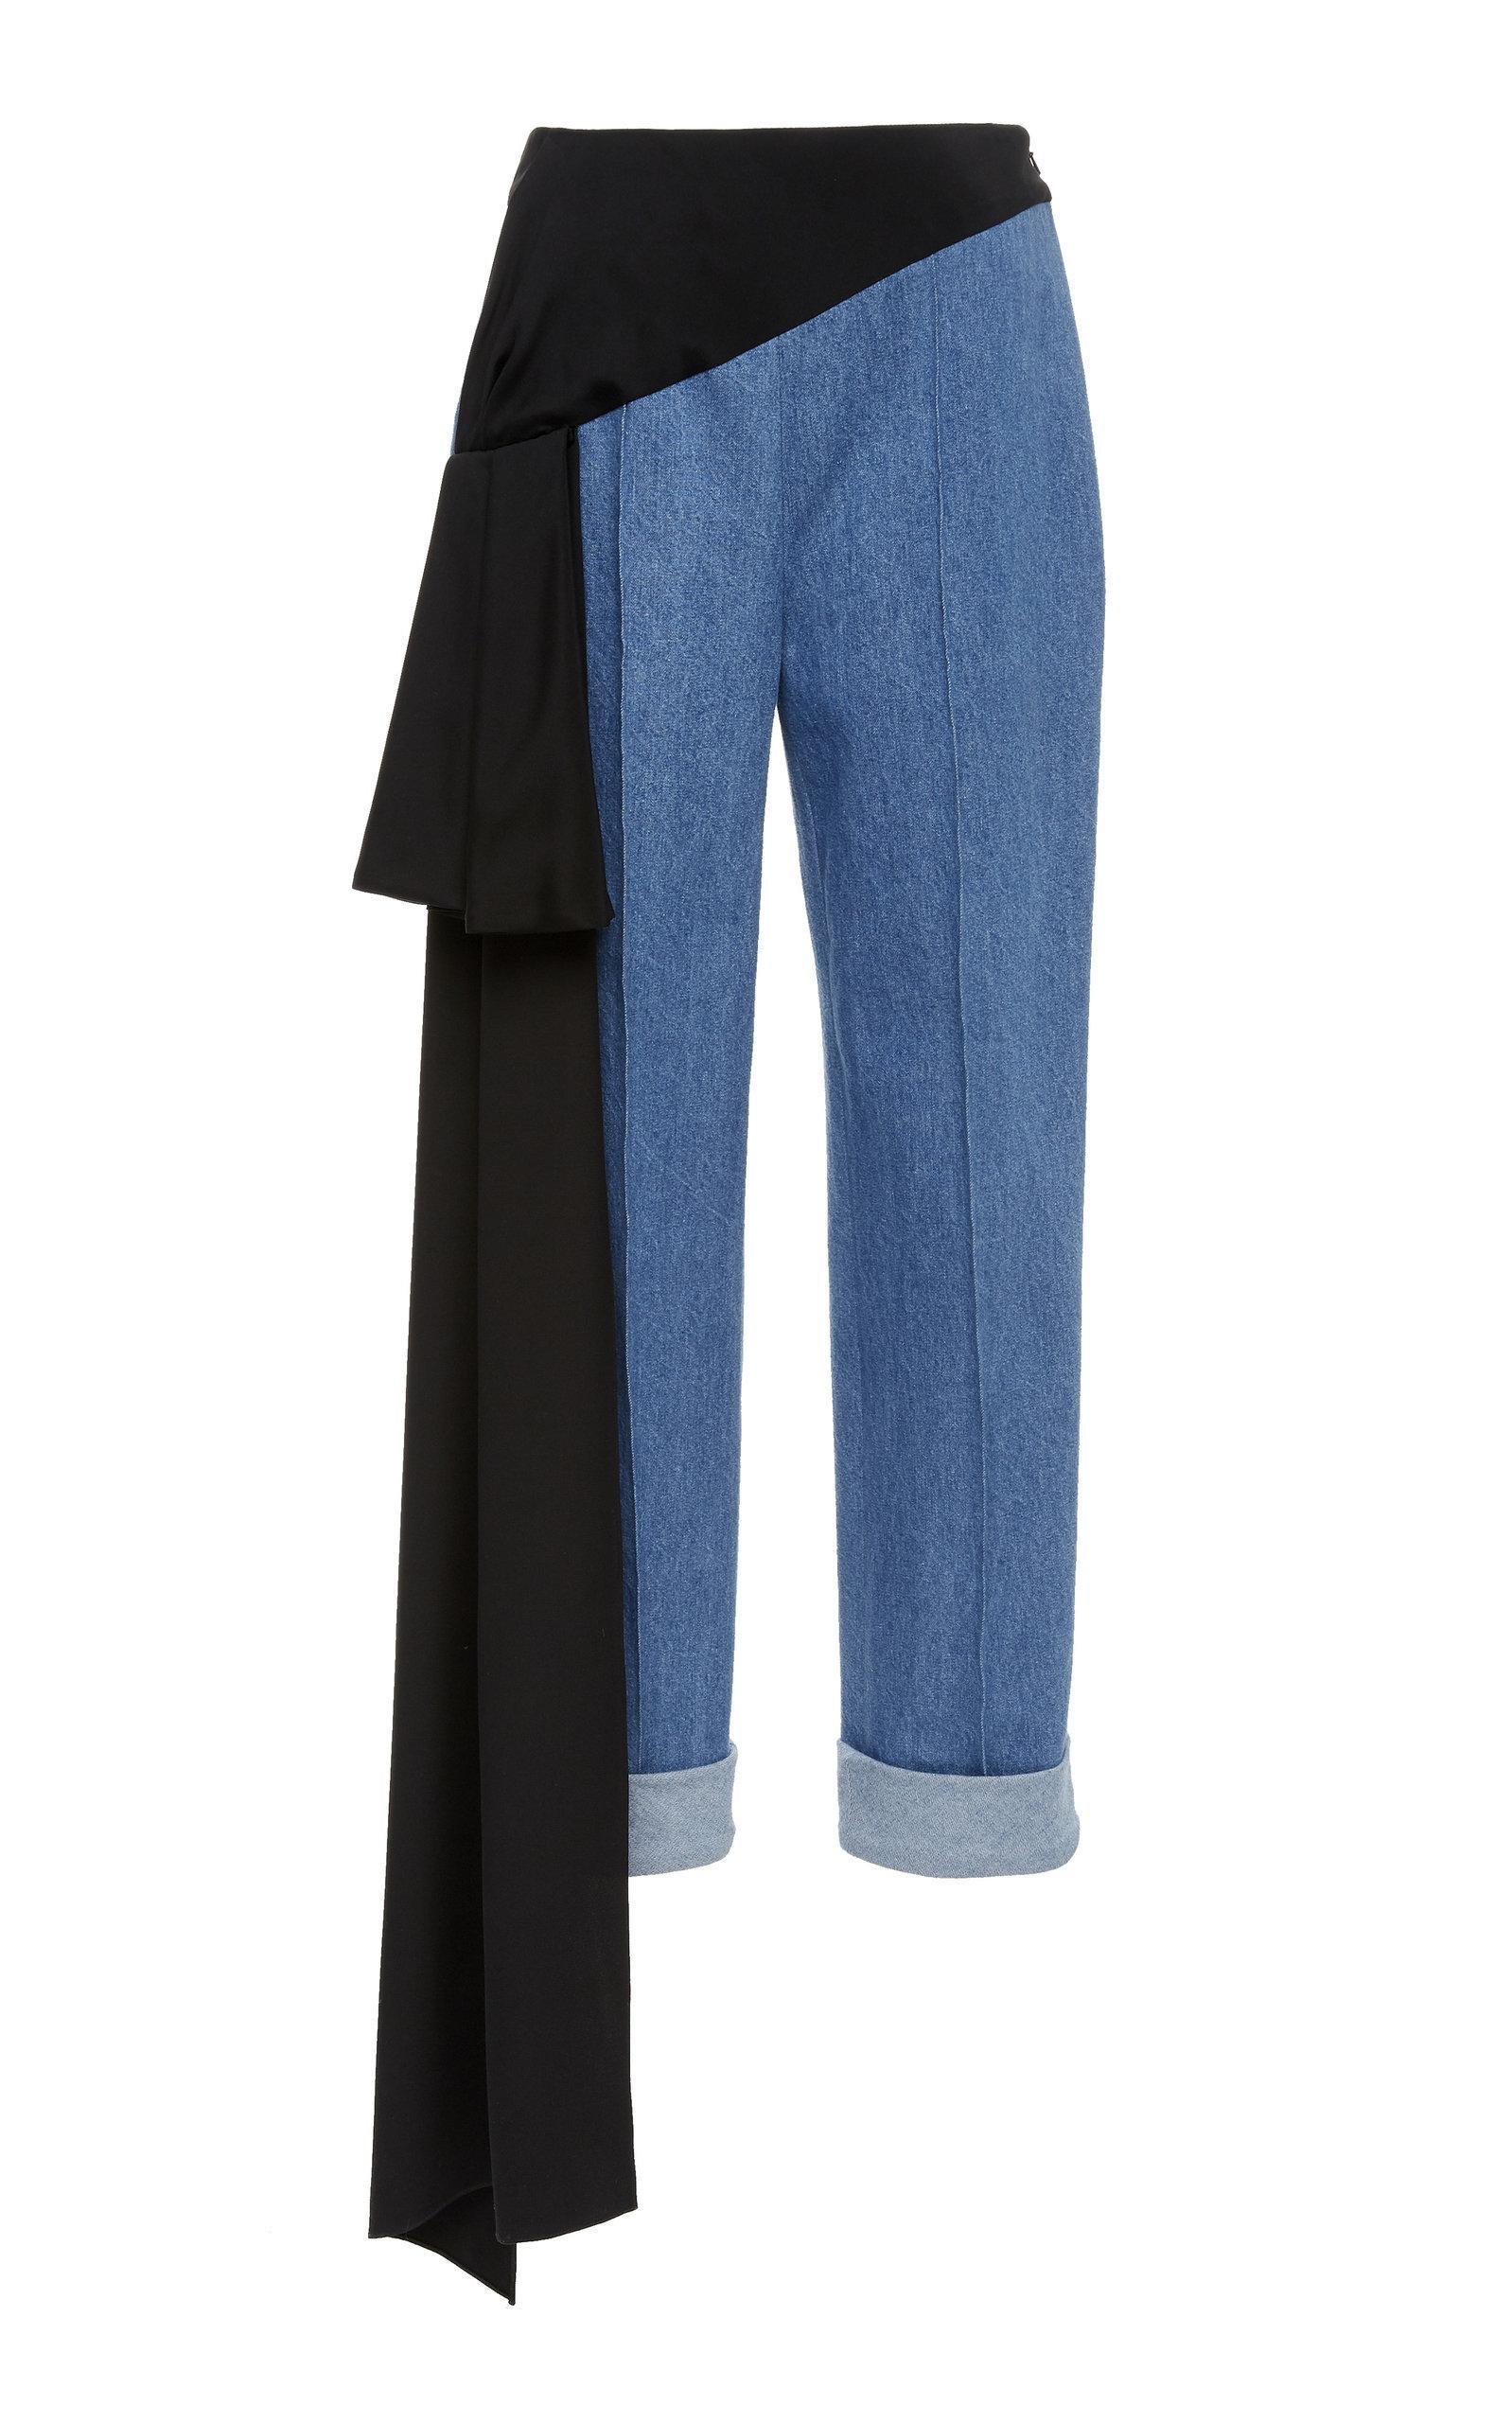 Hellessy Romeo Cigarette Pants In Blue